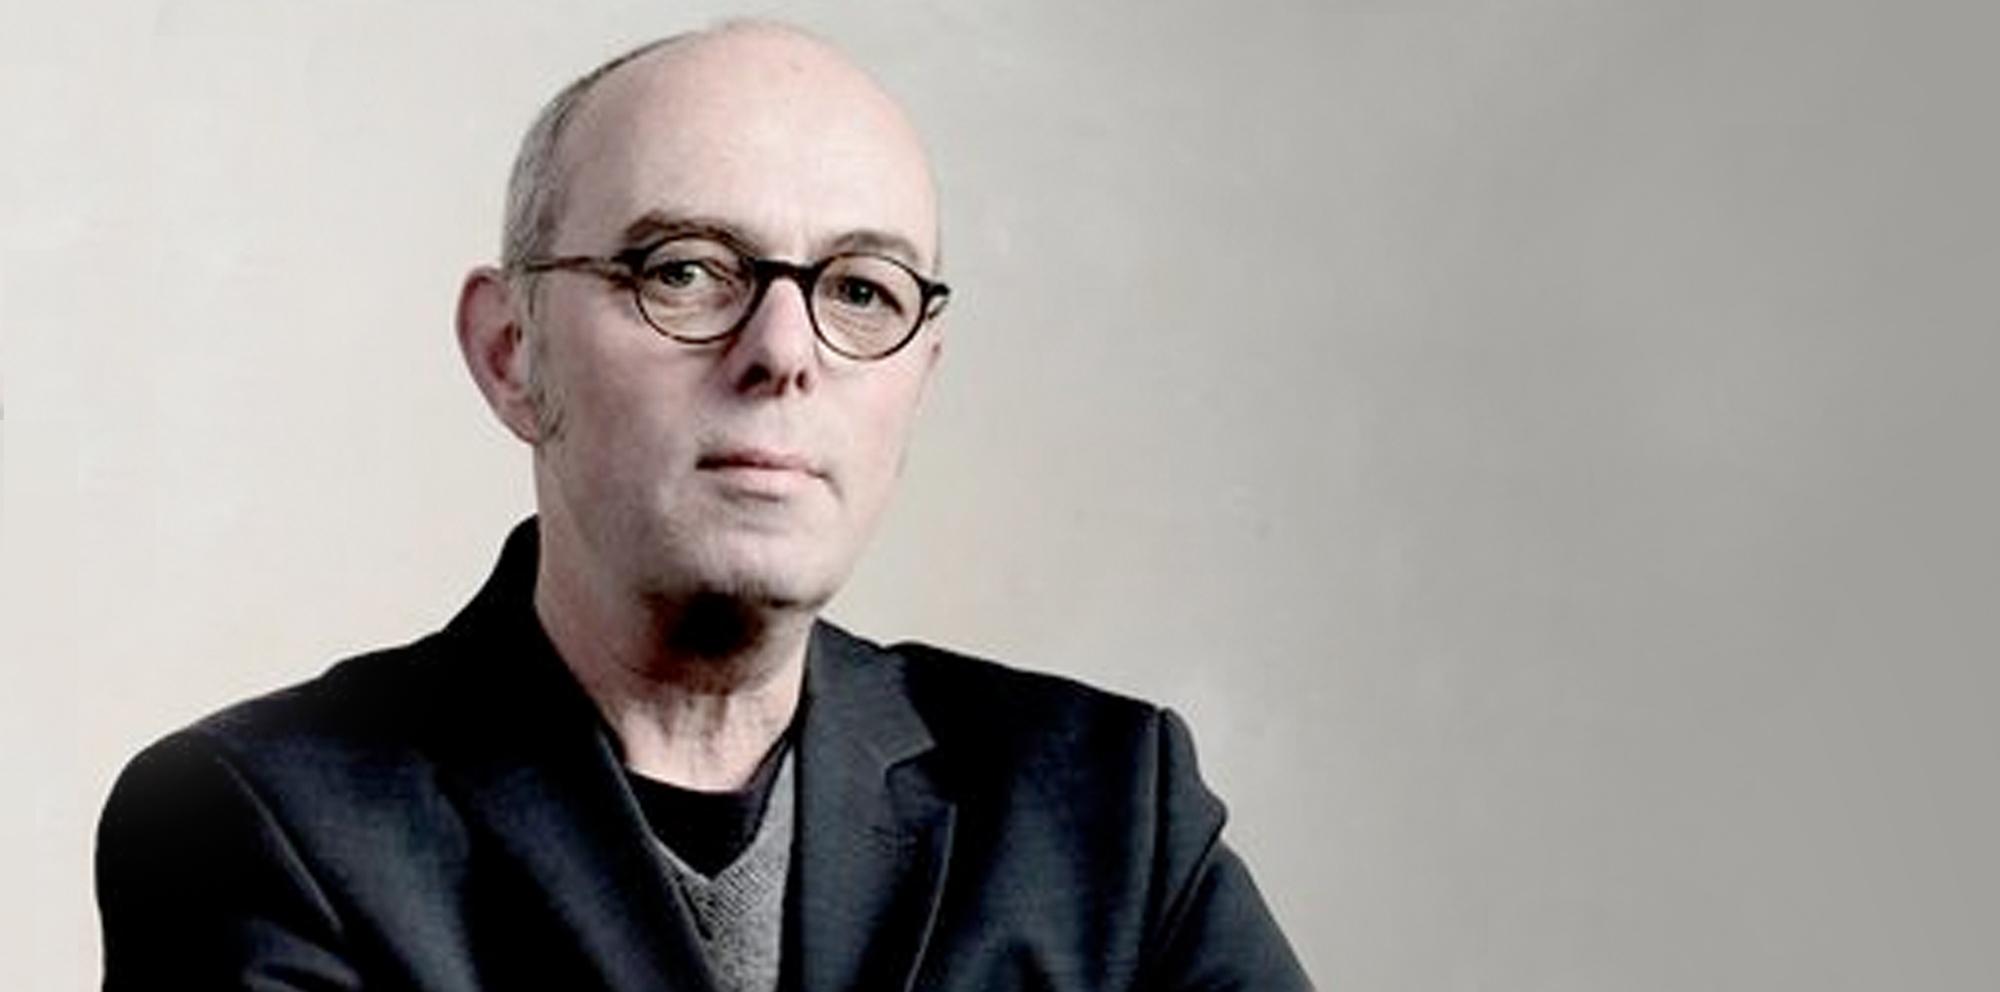 Dokumentarfilmer Jean Boué